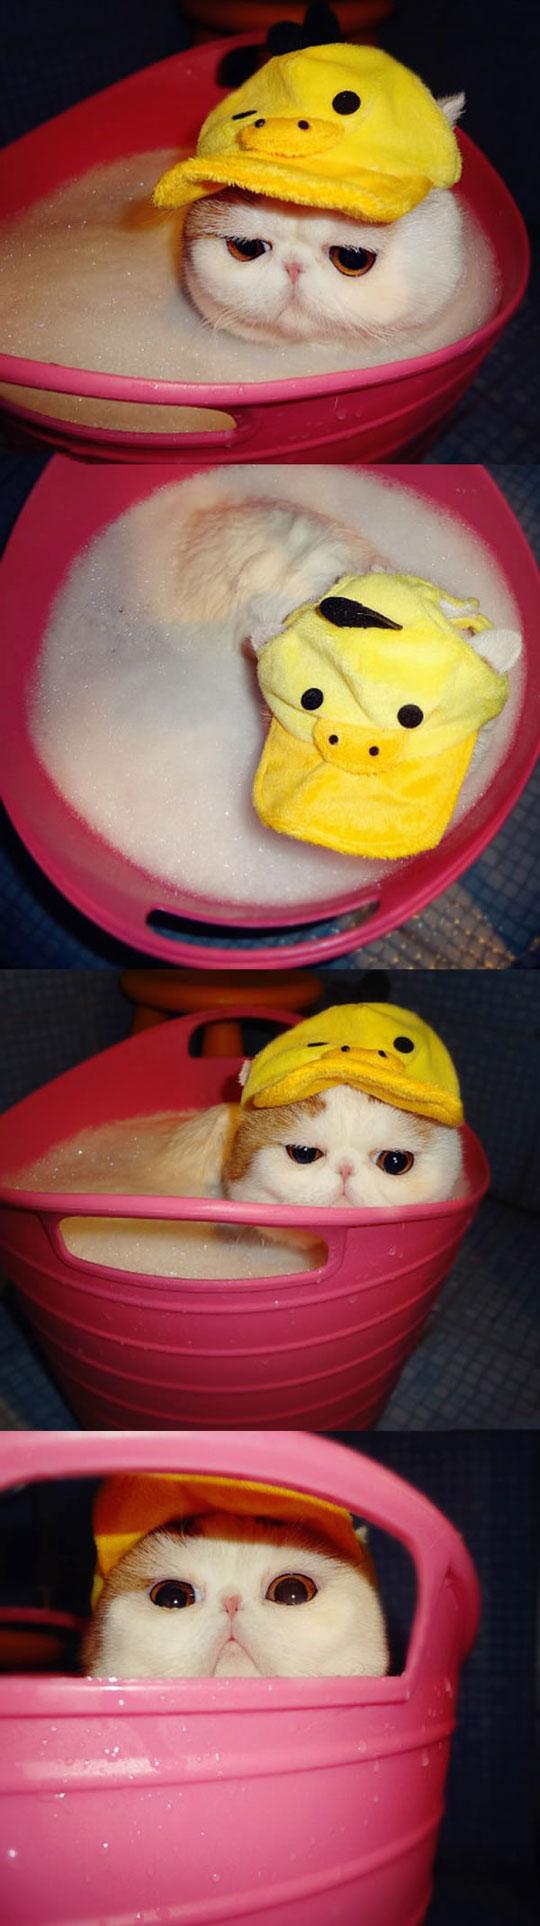 I've got my bath hat on…